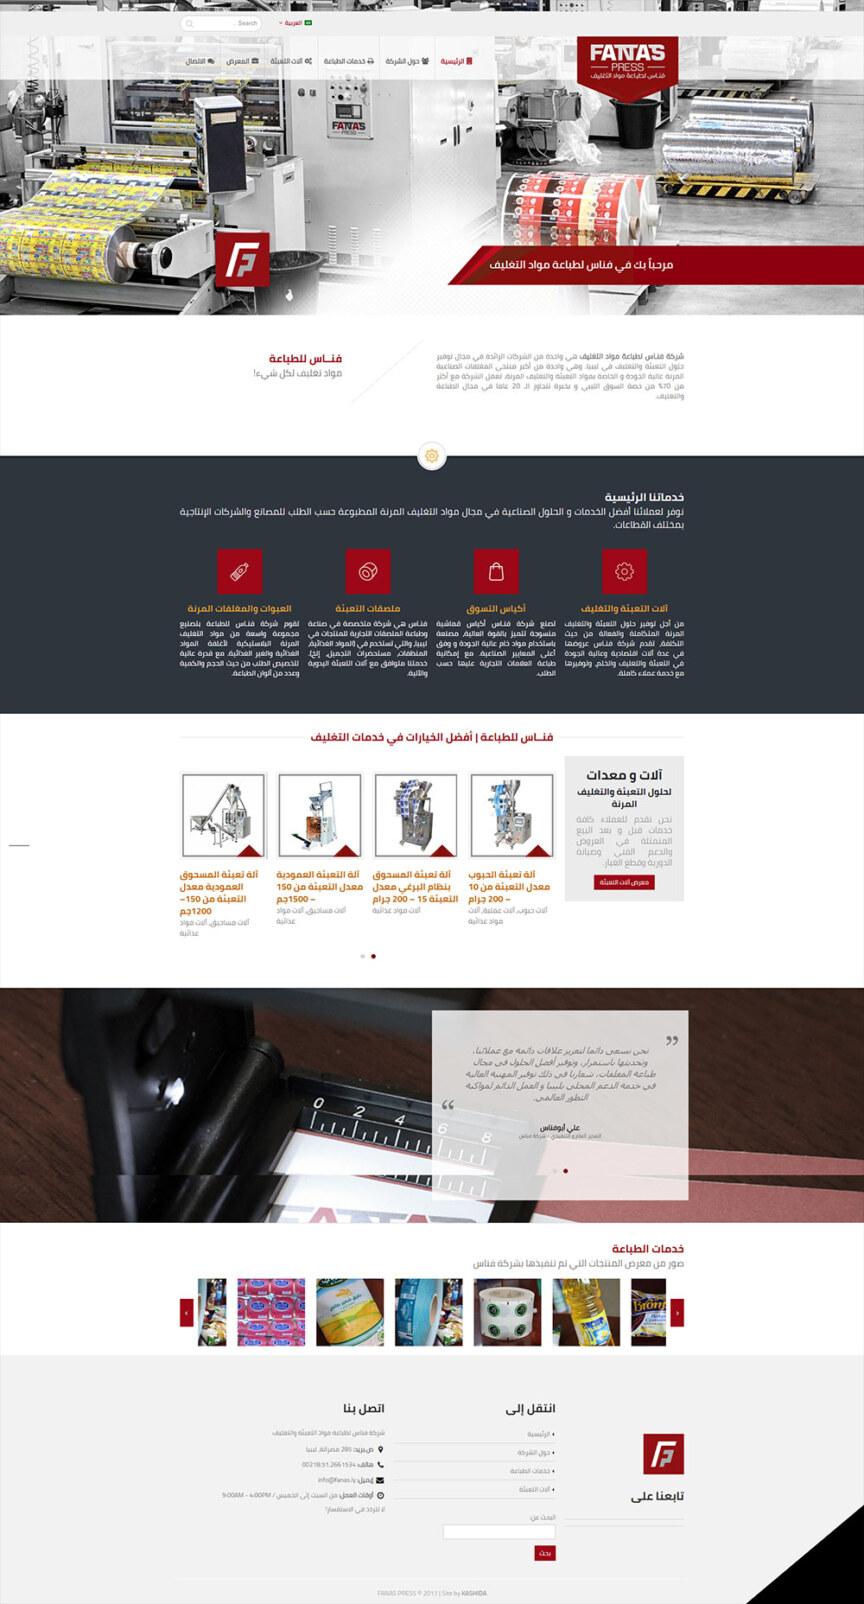 FanasPress-Website-(7)